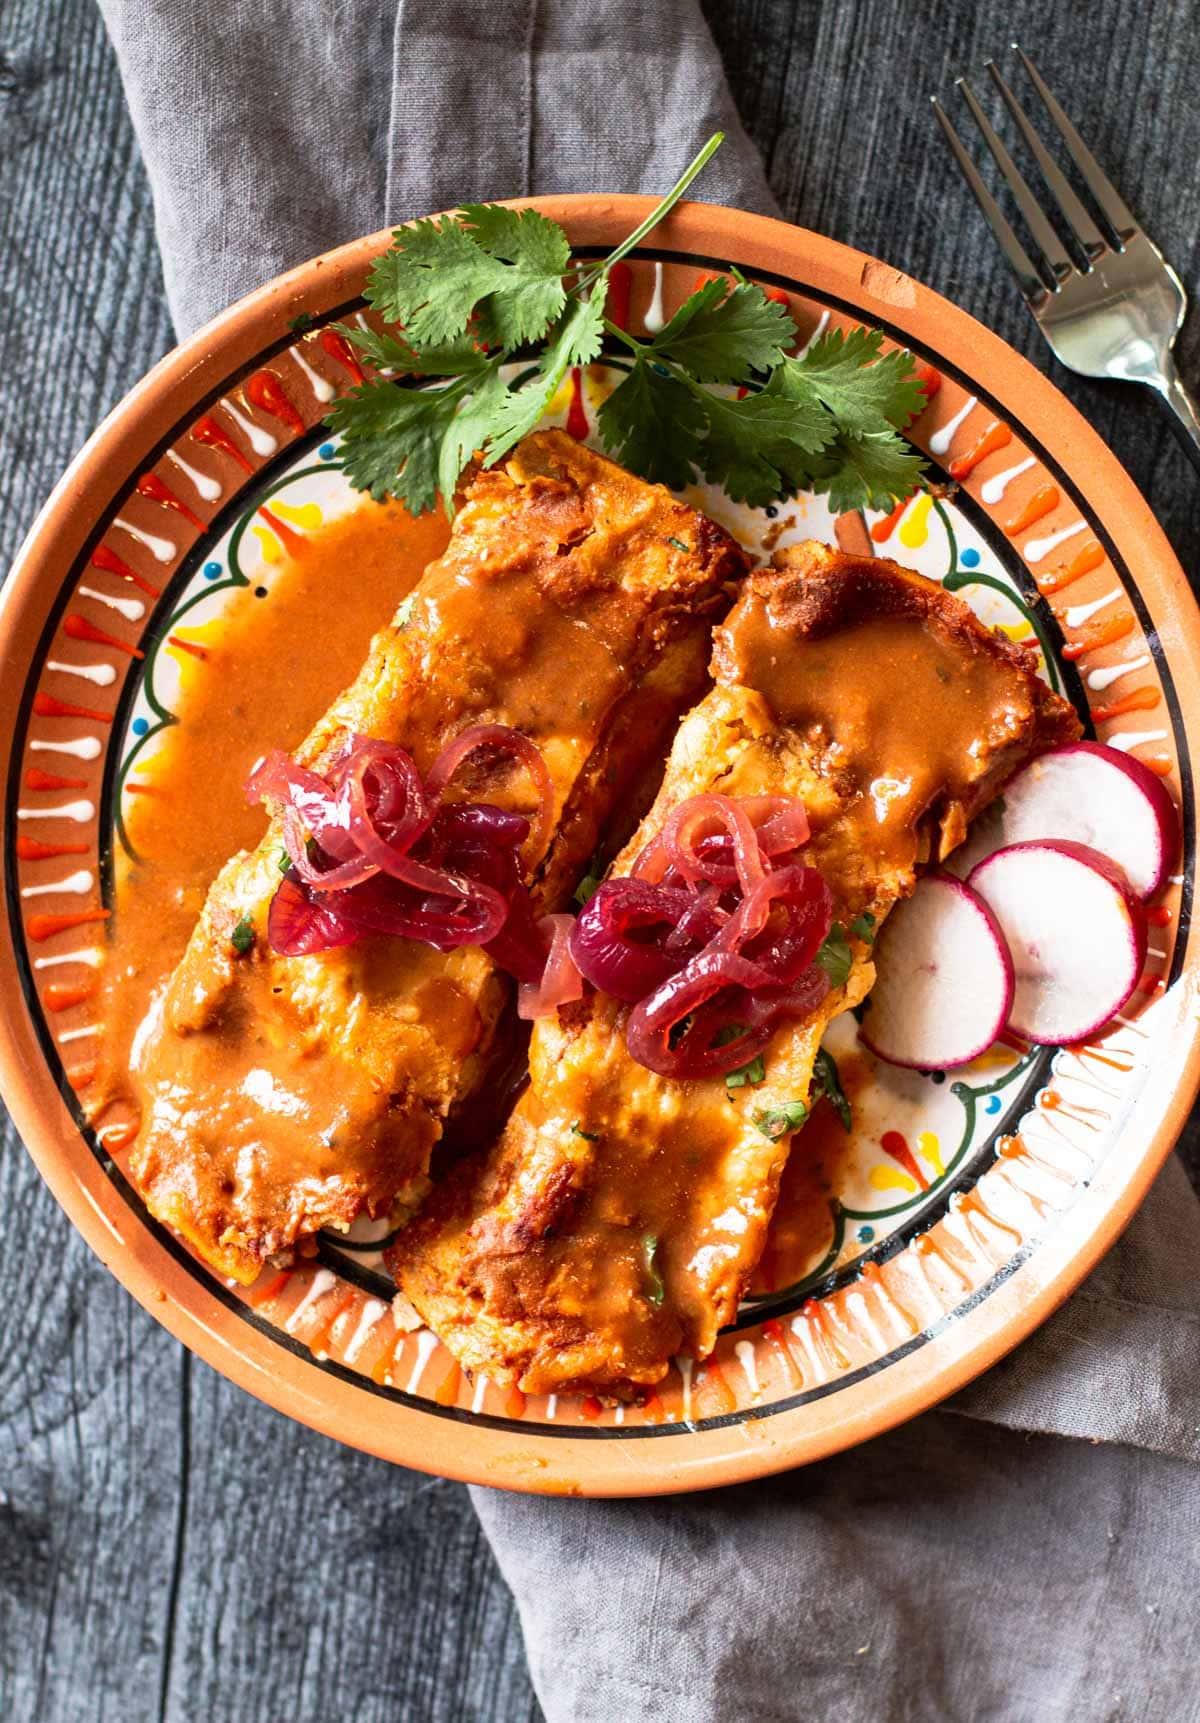 Pork Cochinita Pibel Enchiladas garnished with sliced radish and cilantro